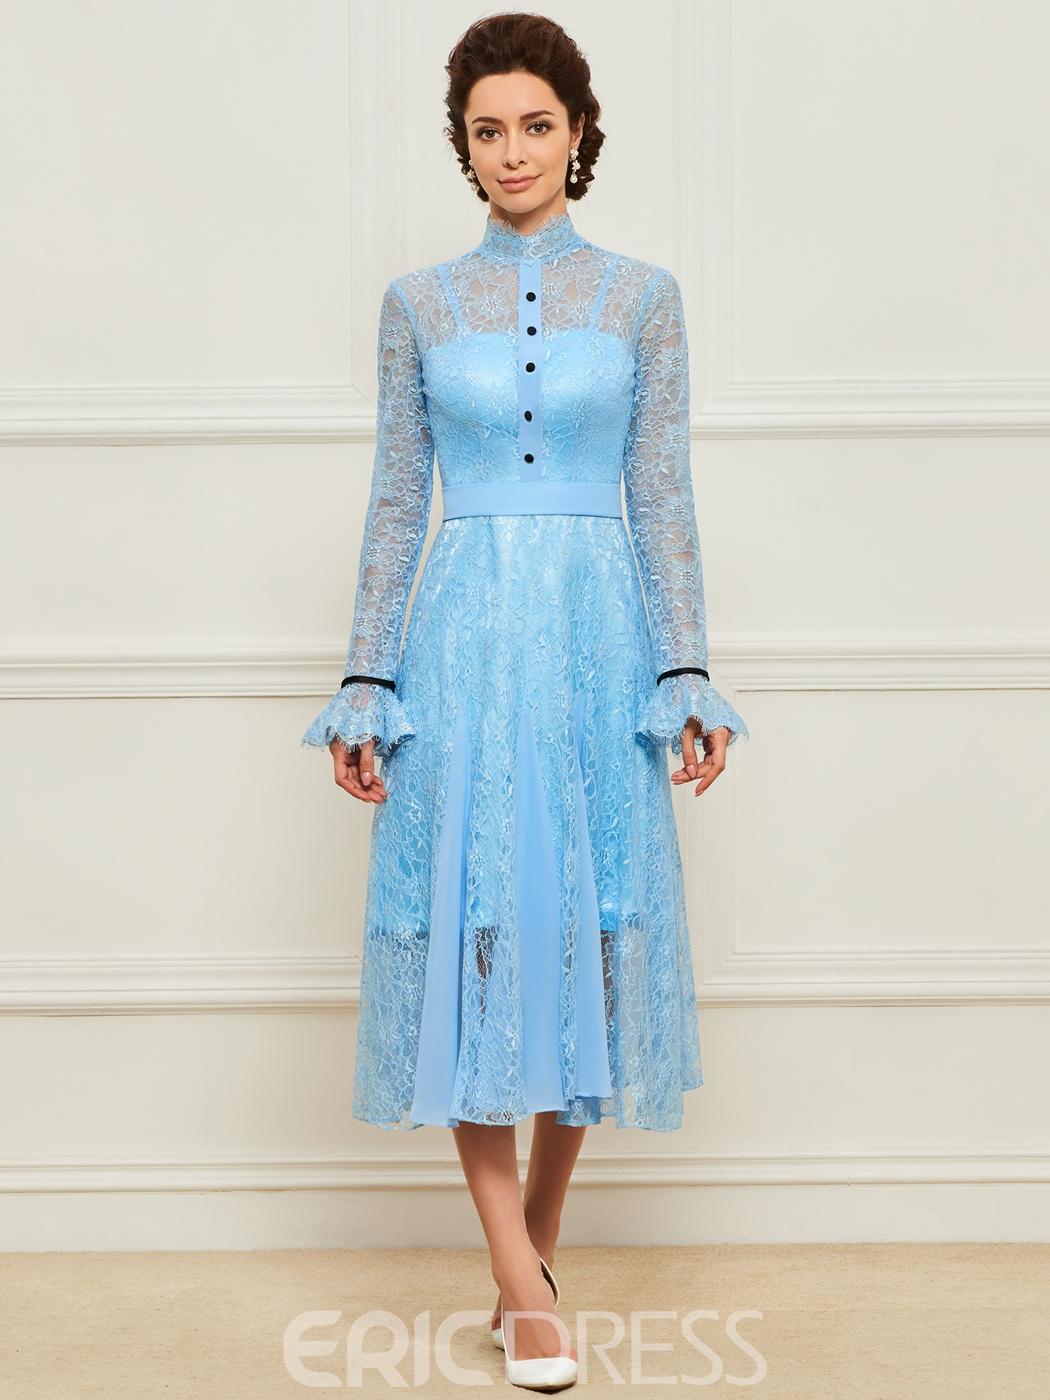 High Neck Lace Tea Length Mother Dress - Cute Dresses